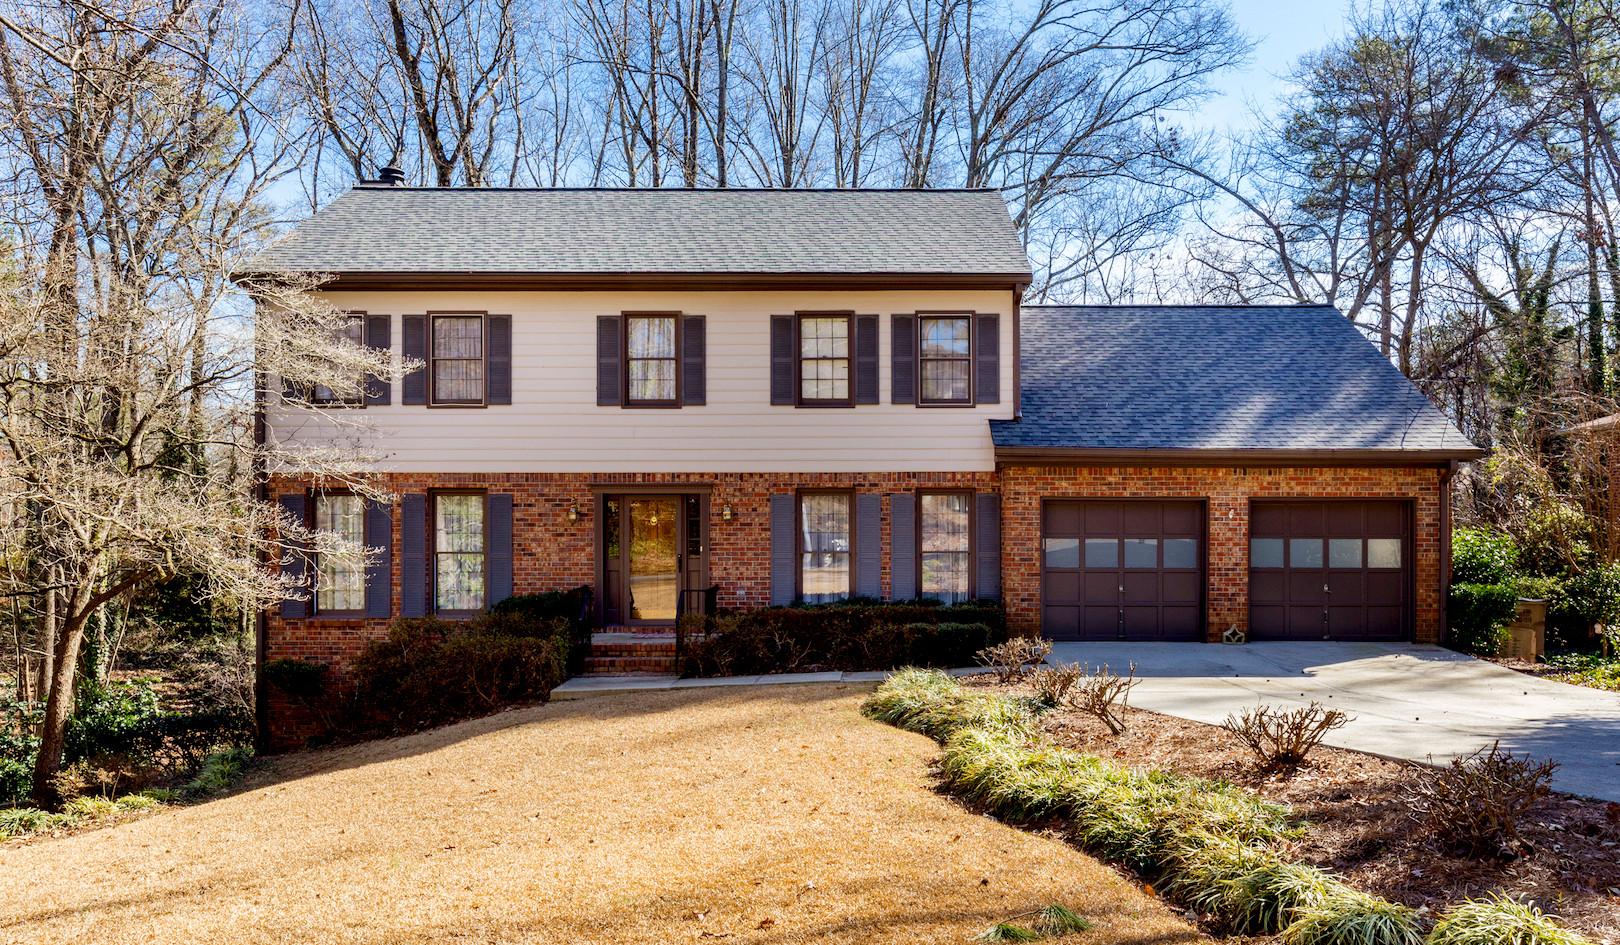 SOLD for $348,000 - Represented Seller (Estate Sale)